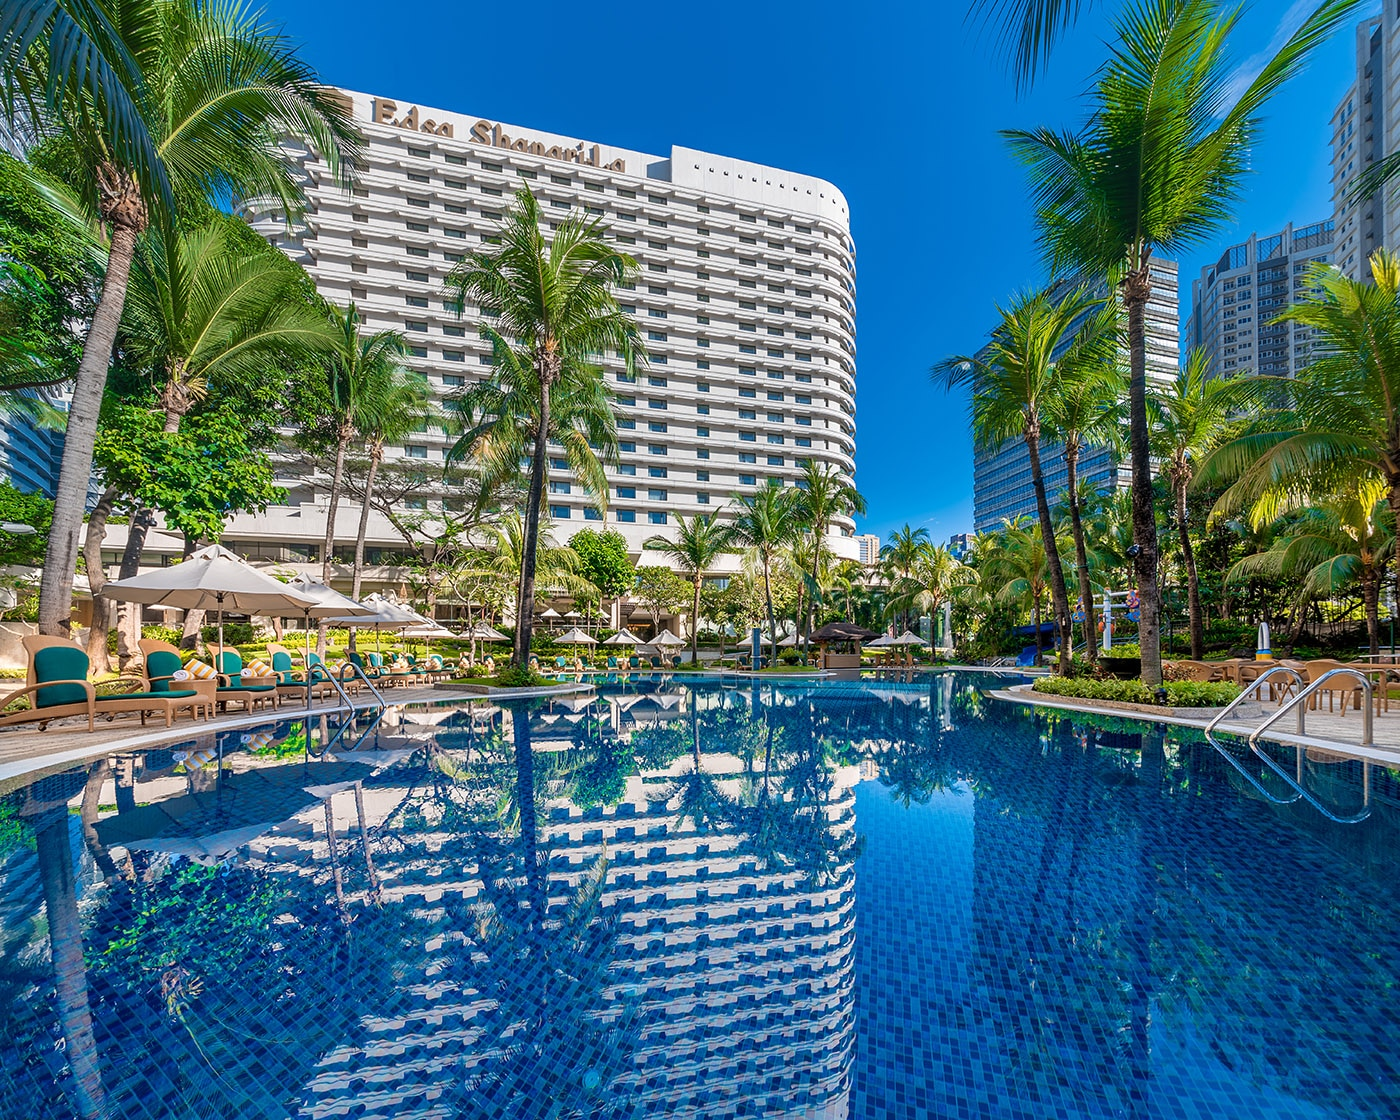 Check out of EDSA Shangri-la Hotel